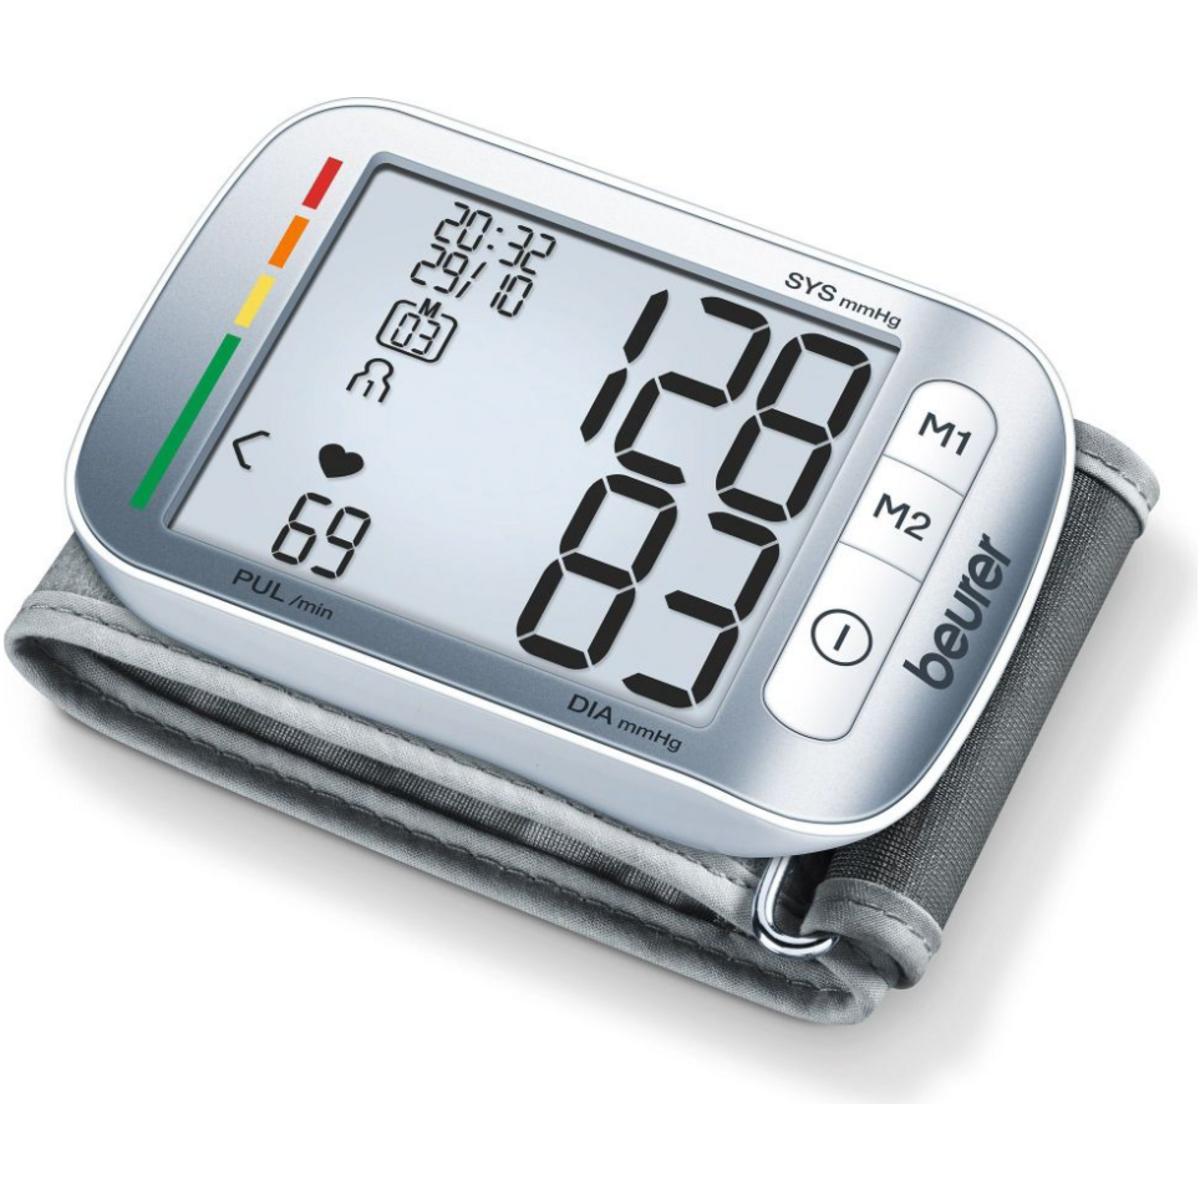 Tensiomètre de poignet BC 50